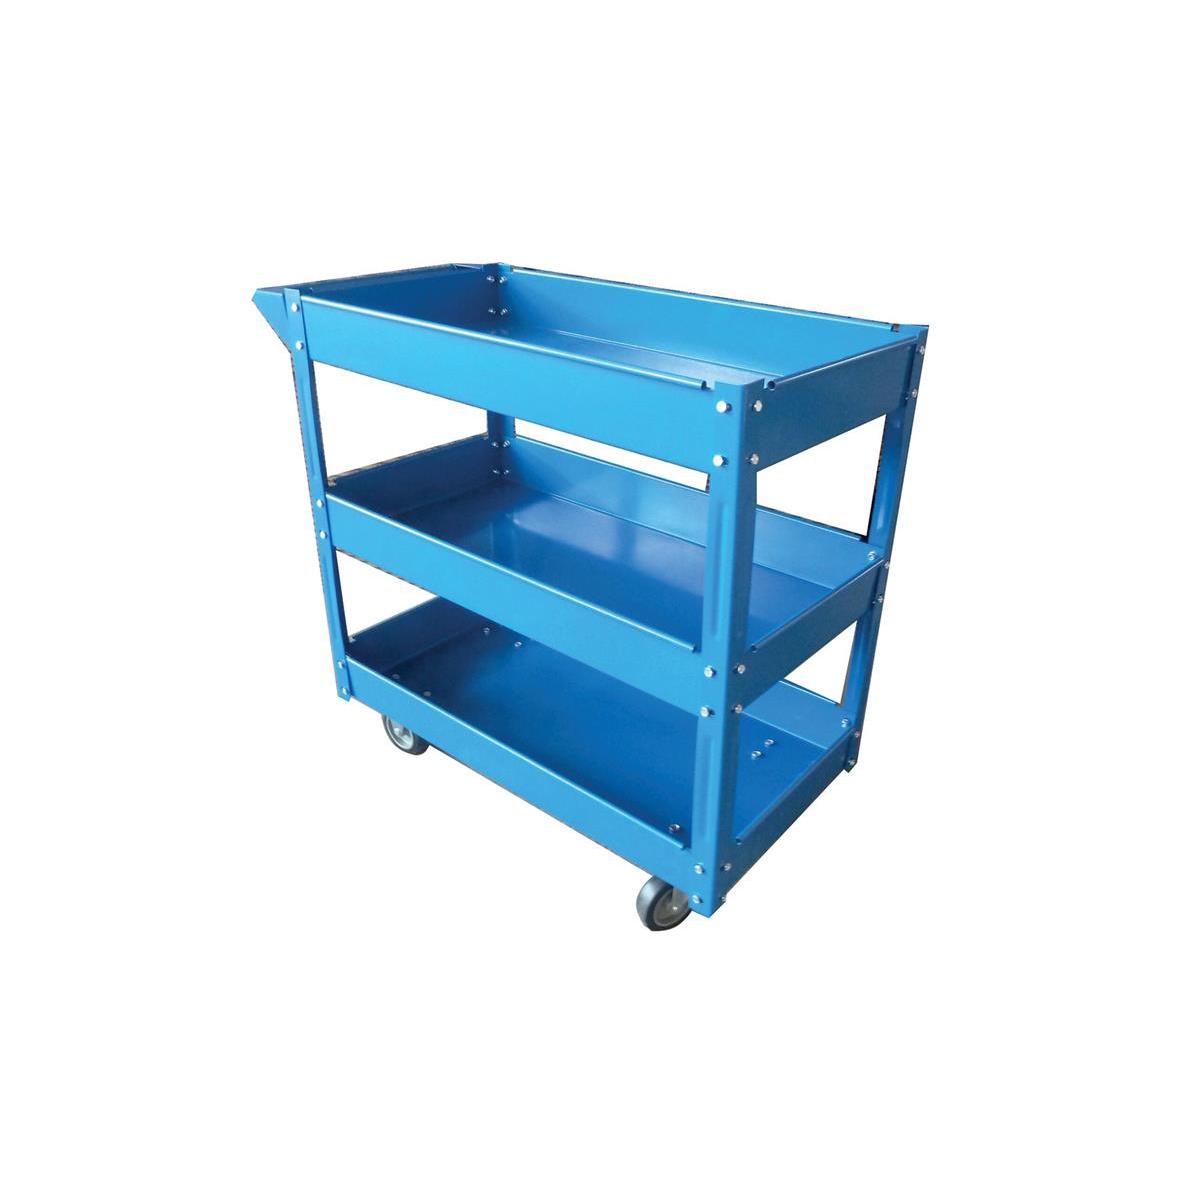 5 Star Facilities serving Trolley 3 Tier W460xD865xH840mm Blue